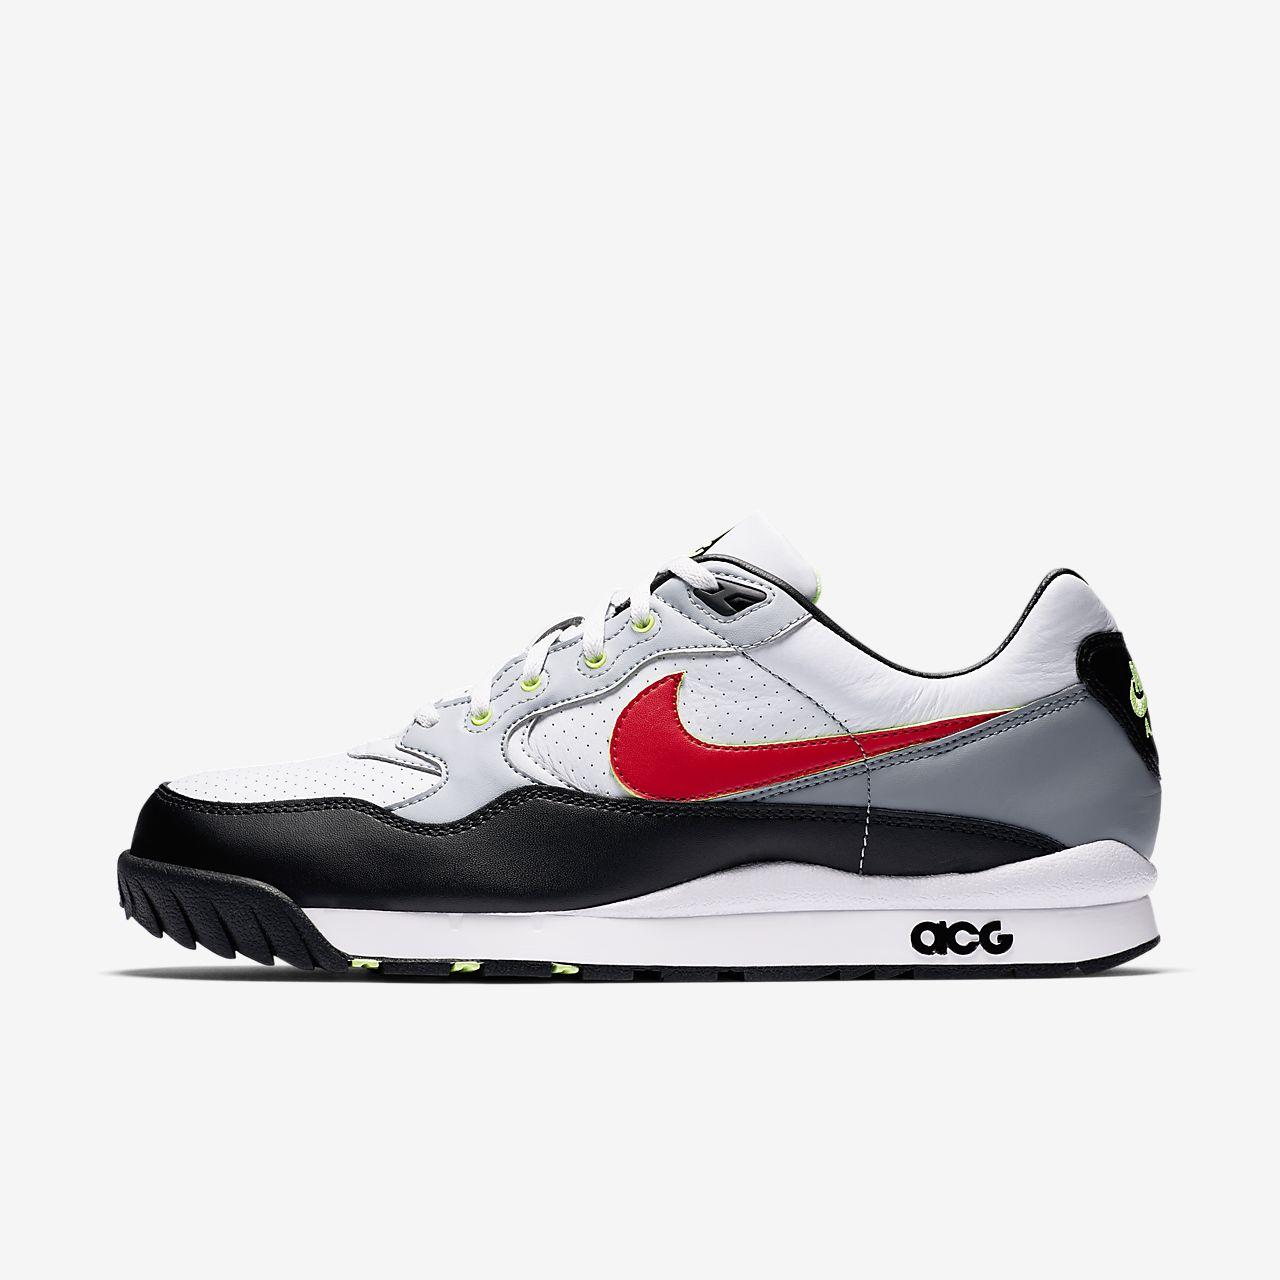 Men's Air Nike Acg Wildwood Shoein Gyb7f6 odrCBxe